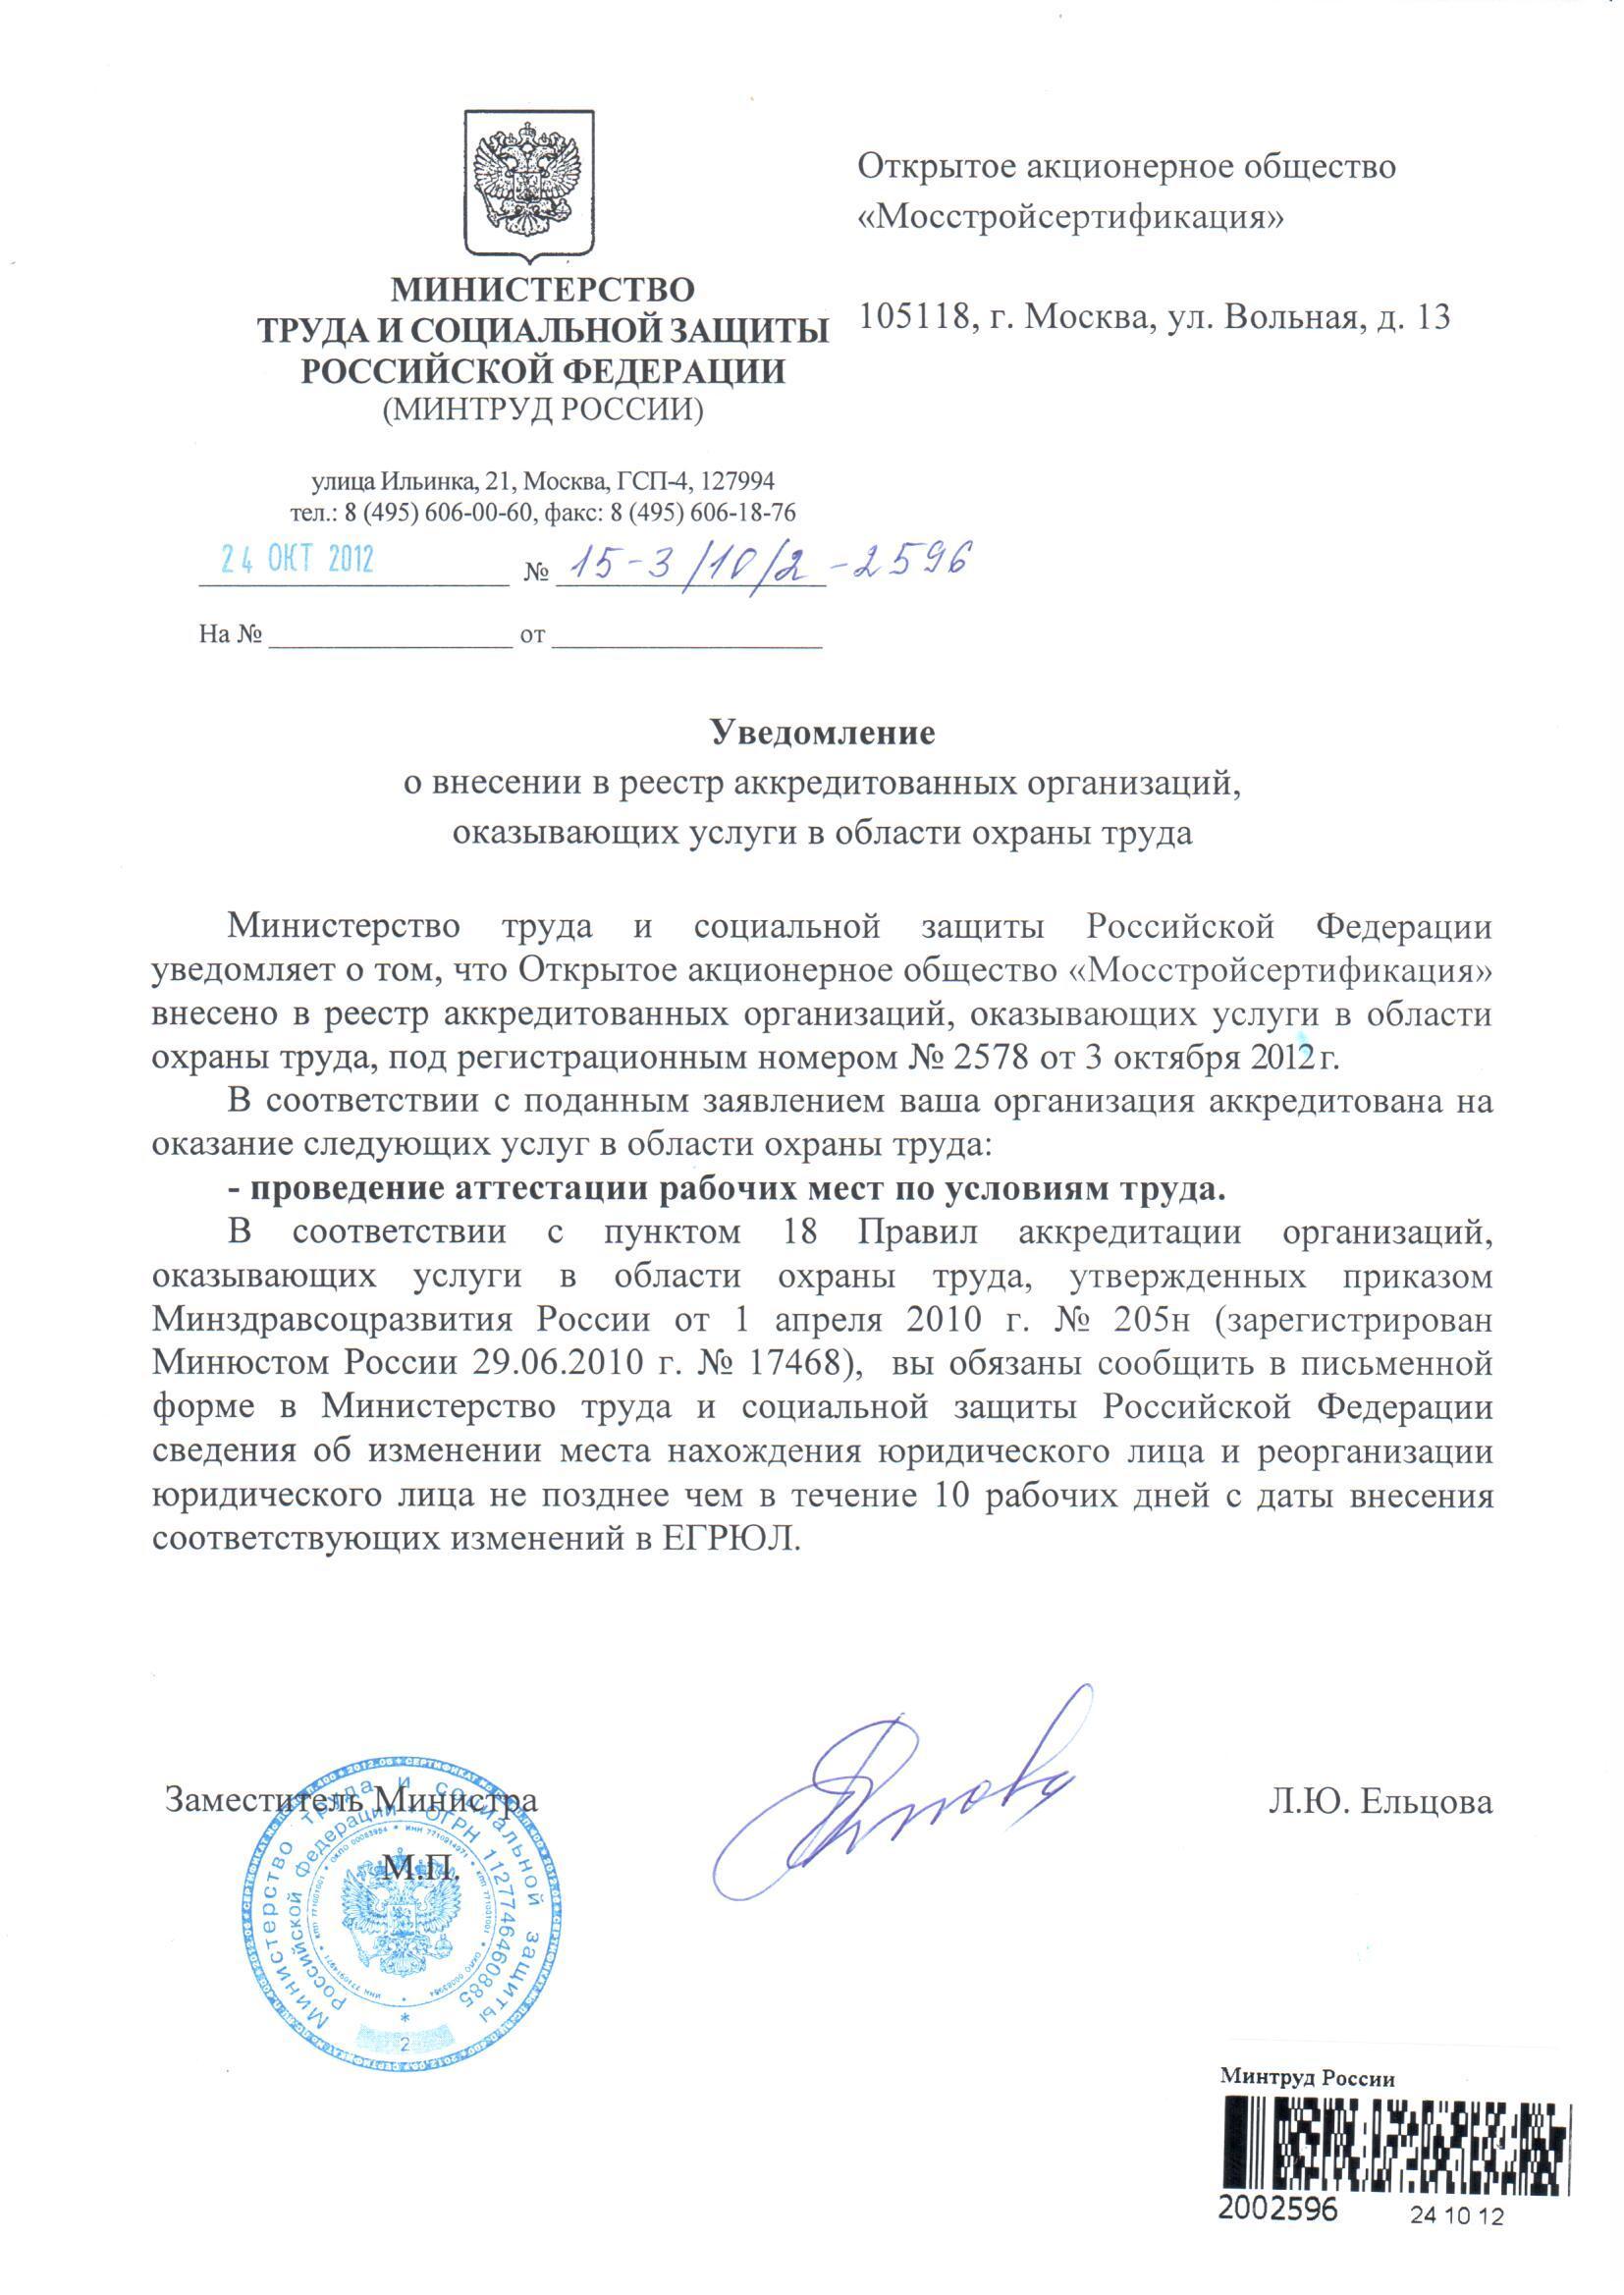 Реестр мосстройсертификация сертификация воды чебоксары